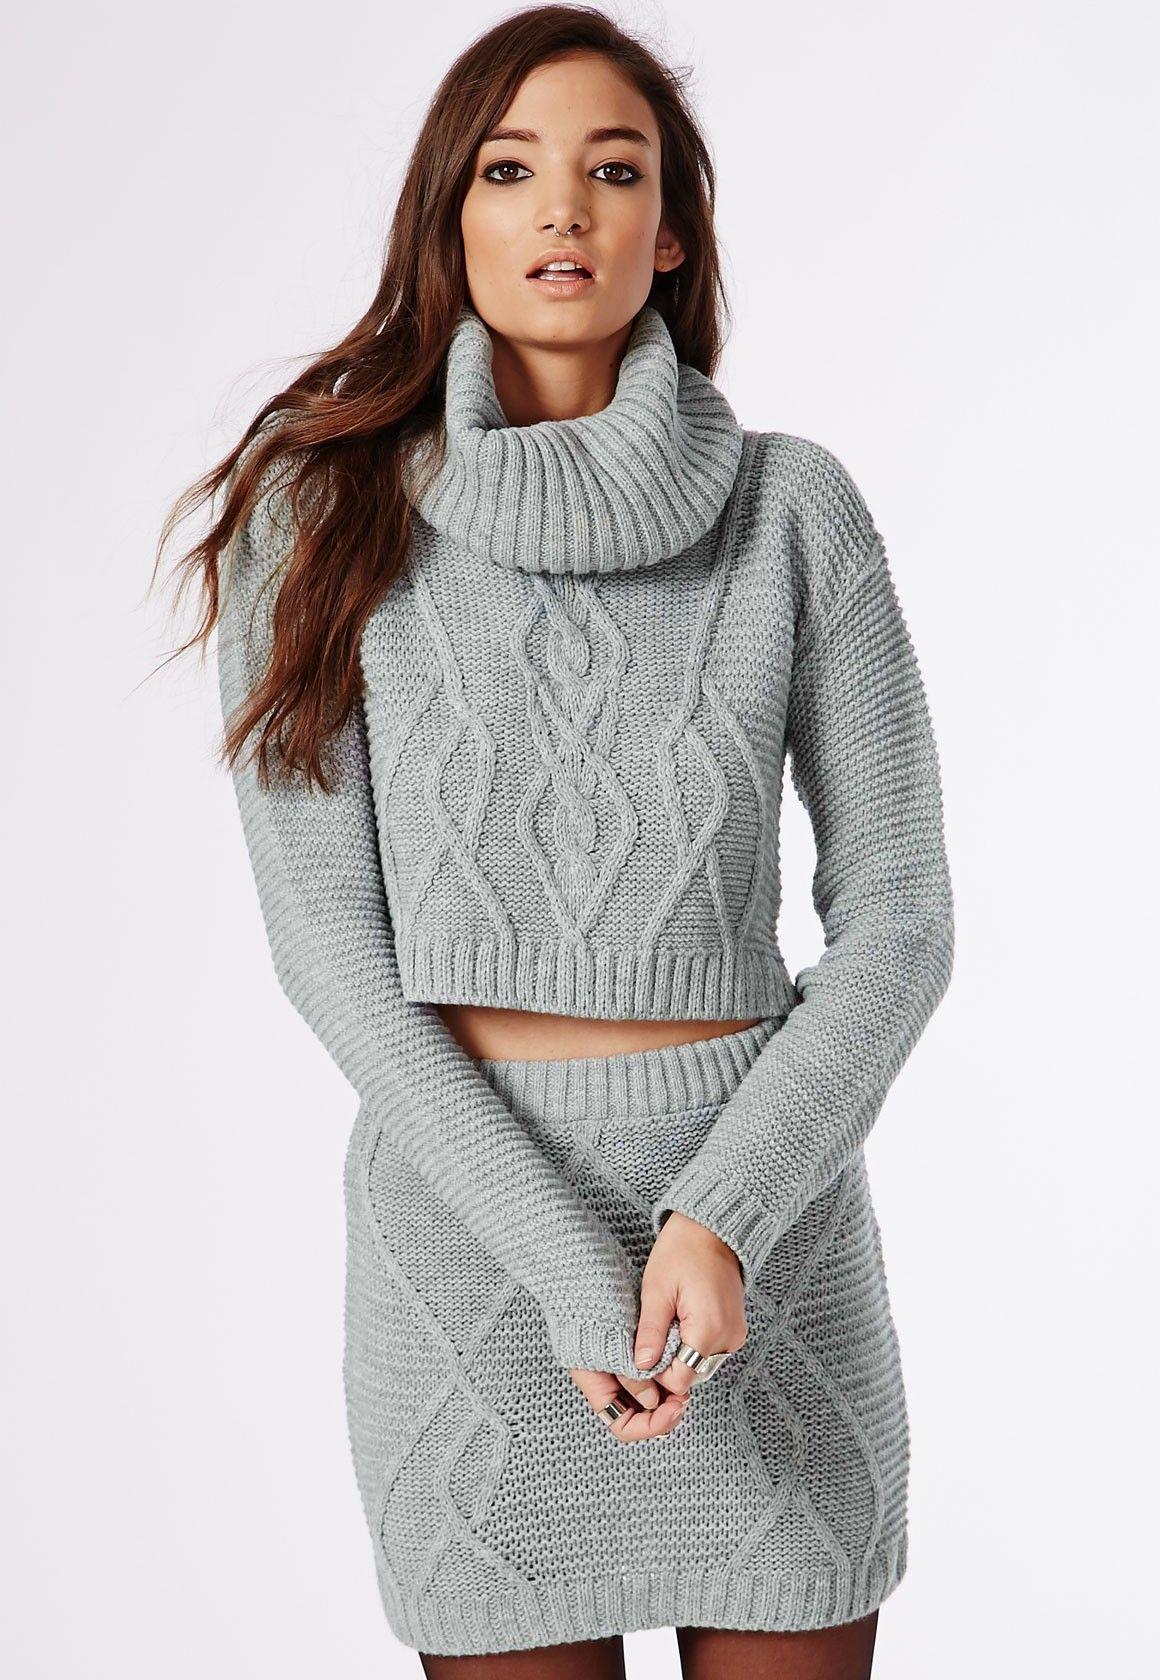 Aliya Roll Neck Cable Knit Crop Jumper Grey - Knitwear ...